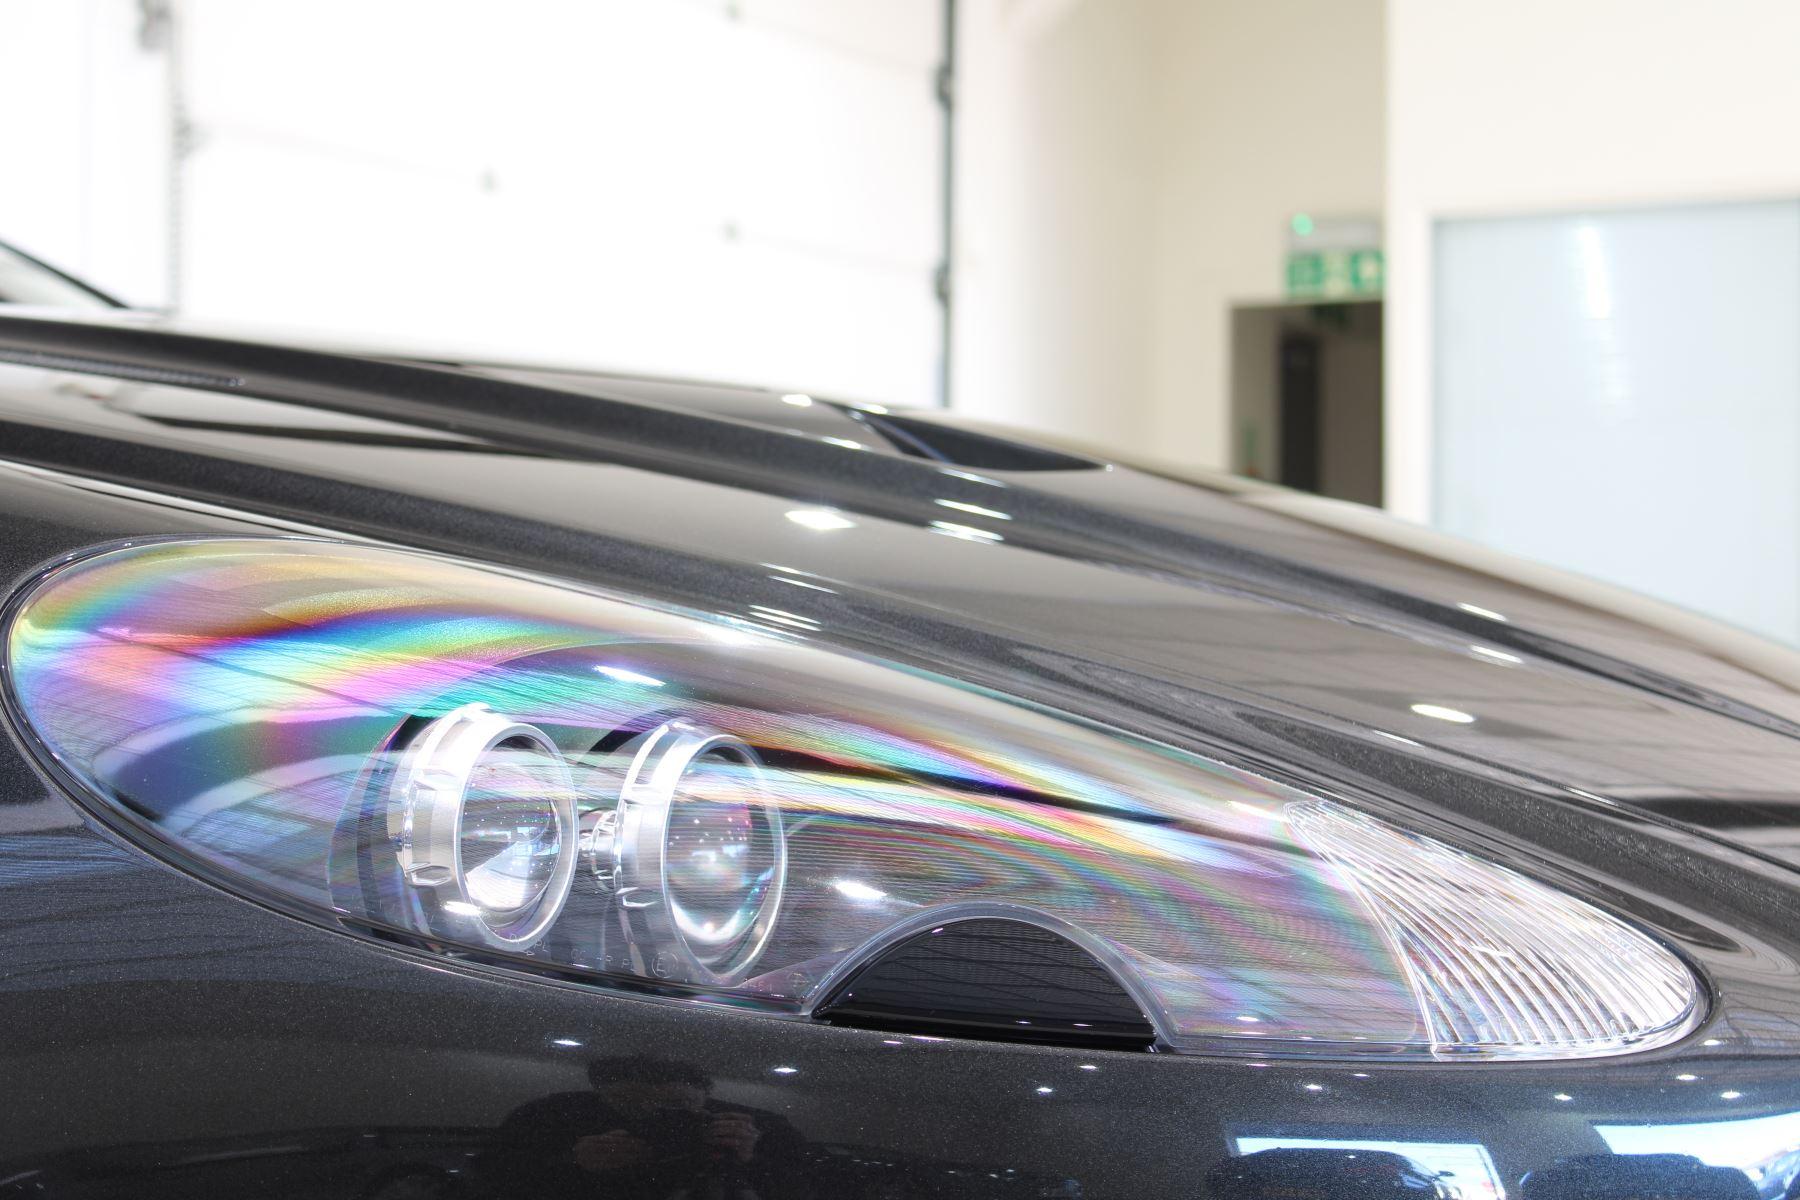 Aston Martin DBS CARBON V12 2dr Volante Touchtronic image 9